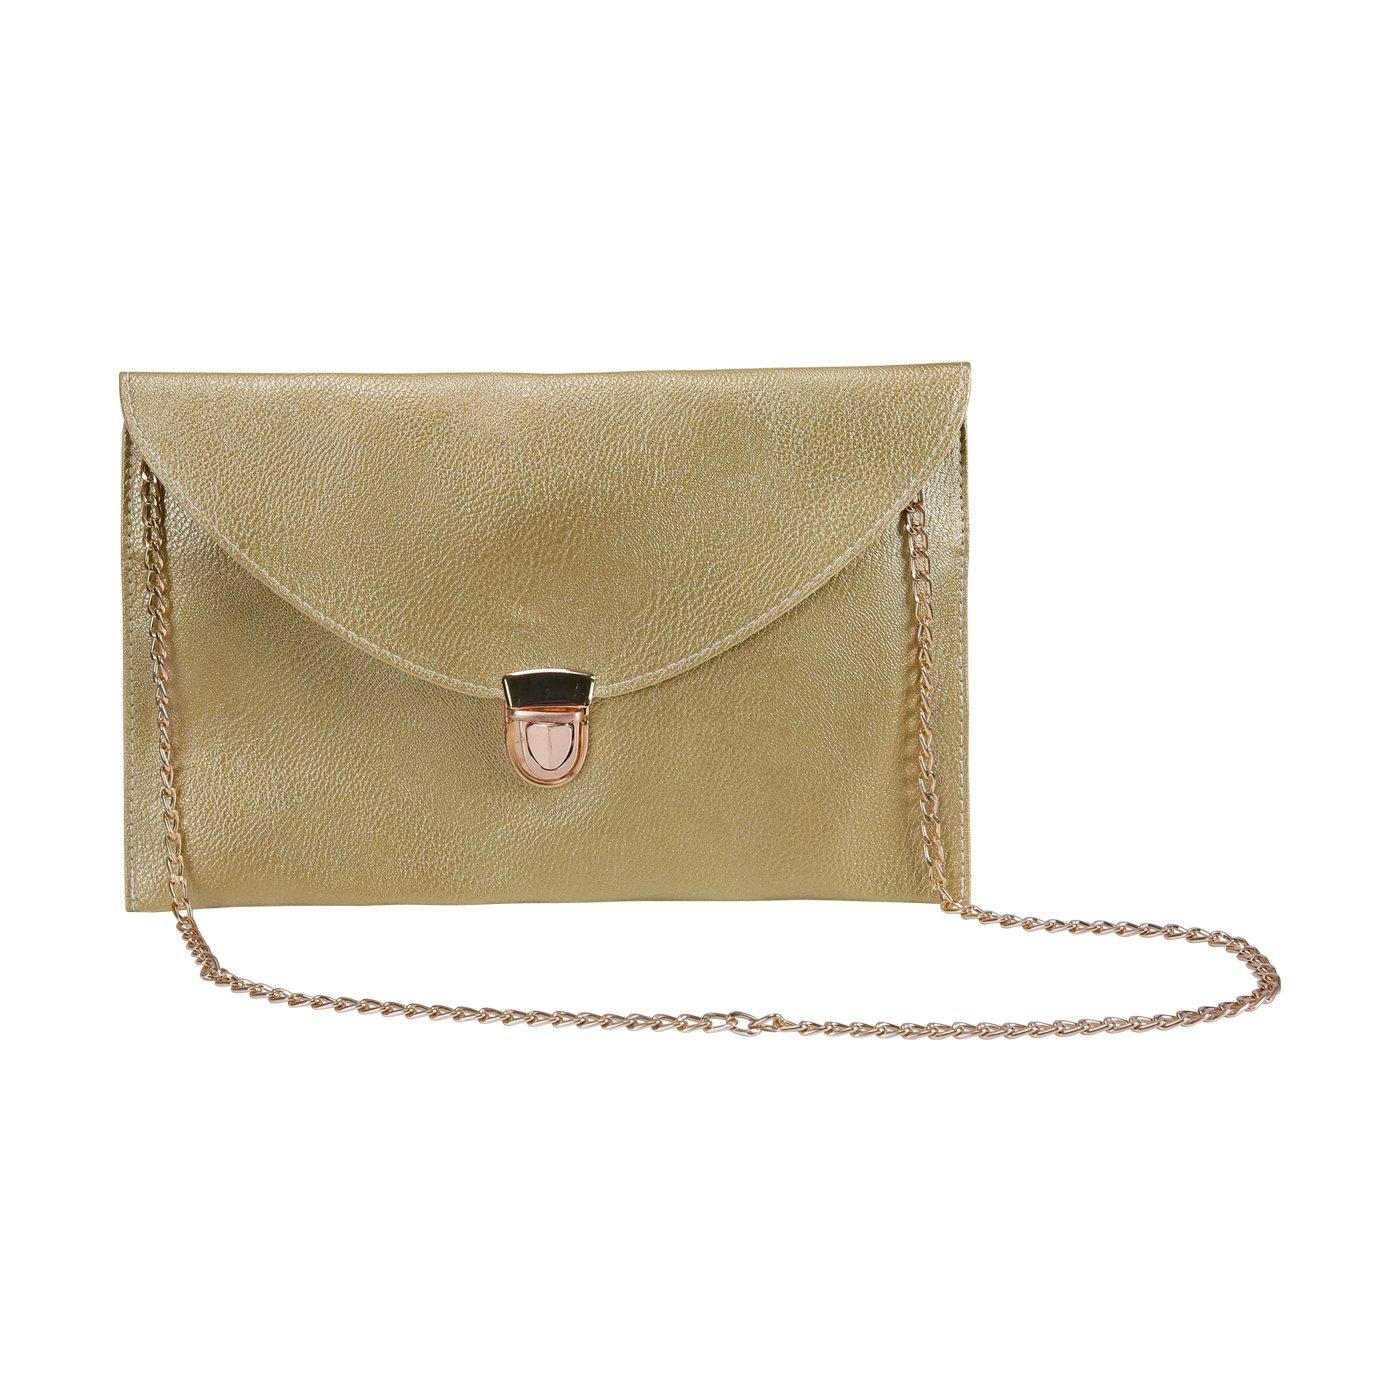 HDE Women's Fashion Cross Body Gold Buckle Purse Vegan Leather Envelope Handbag